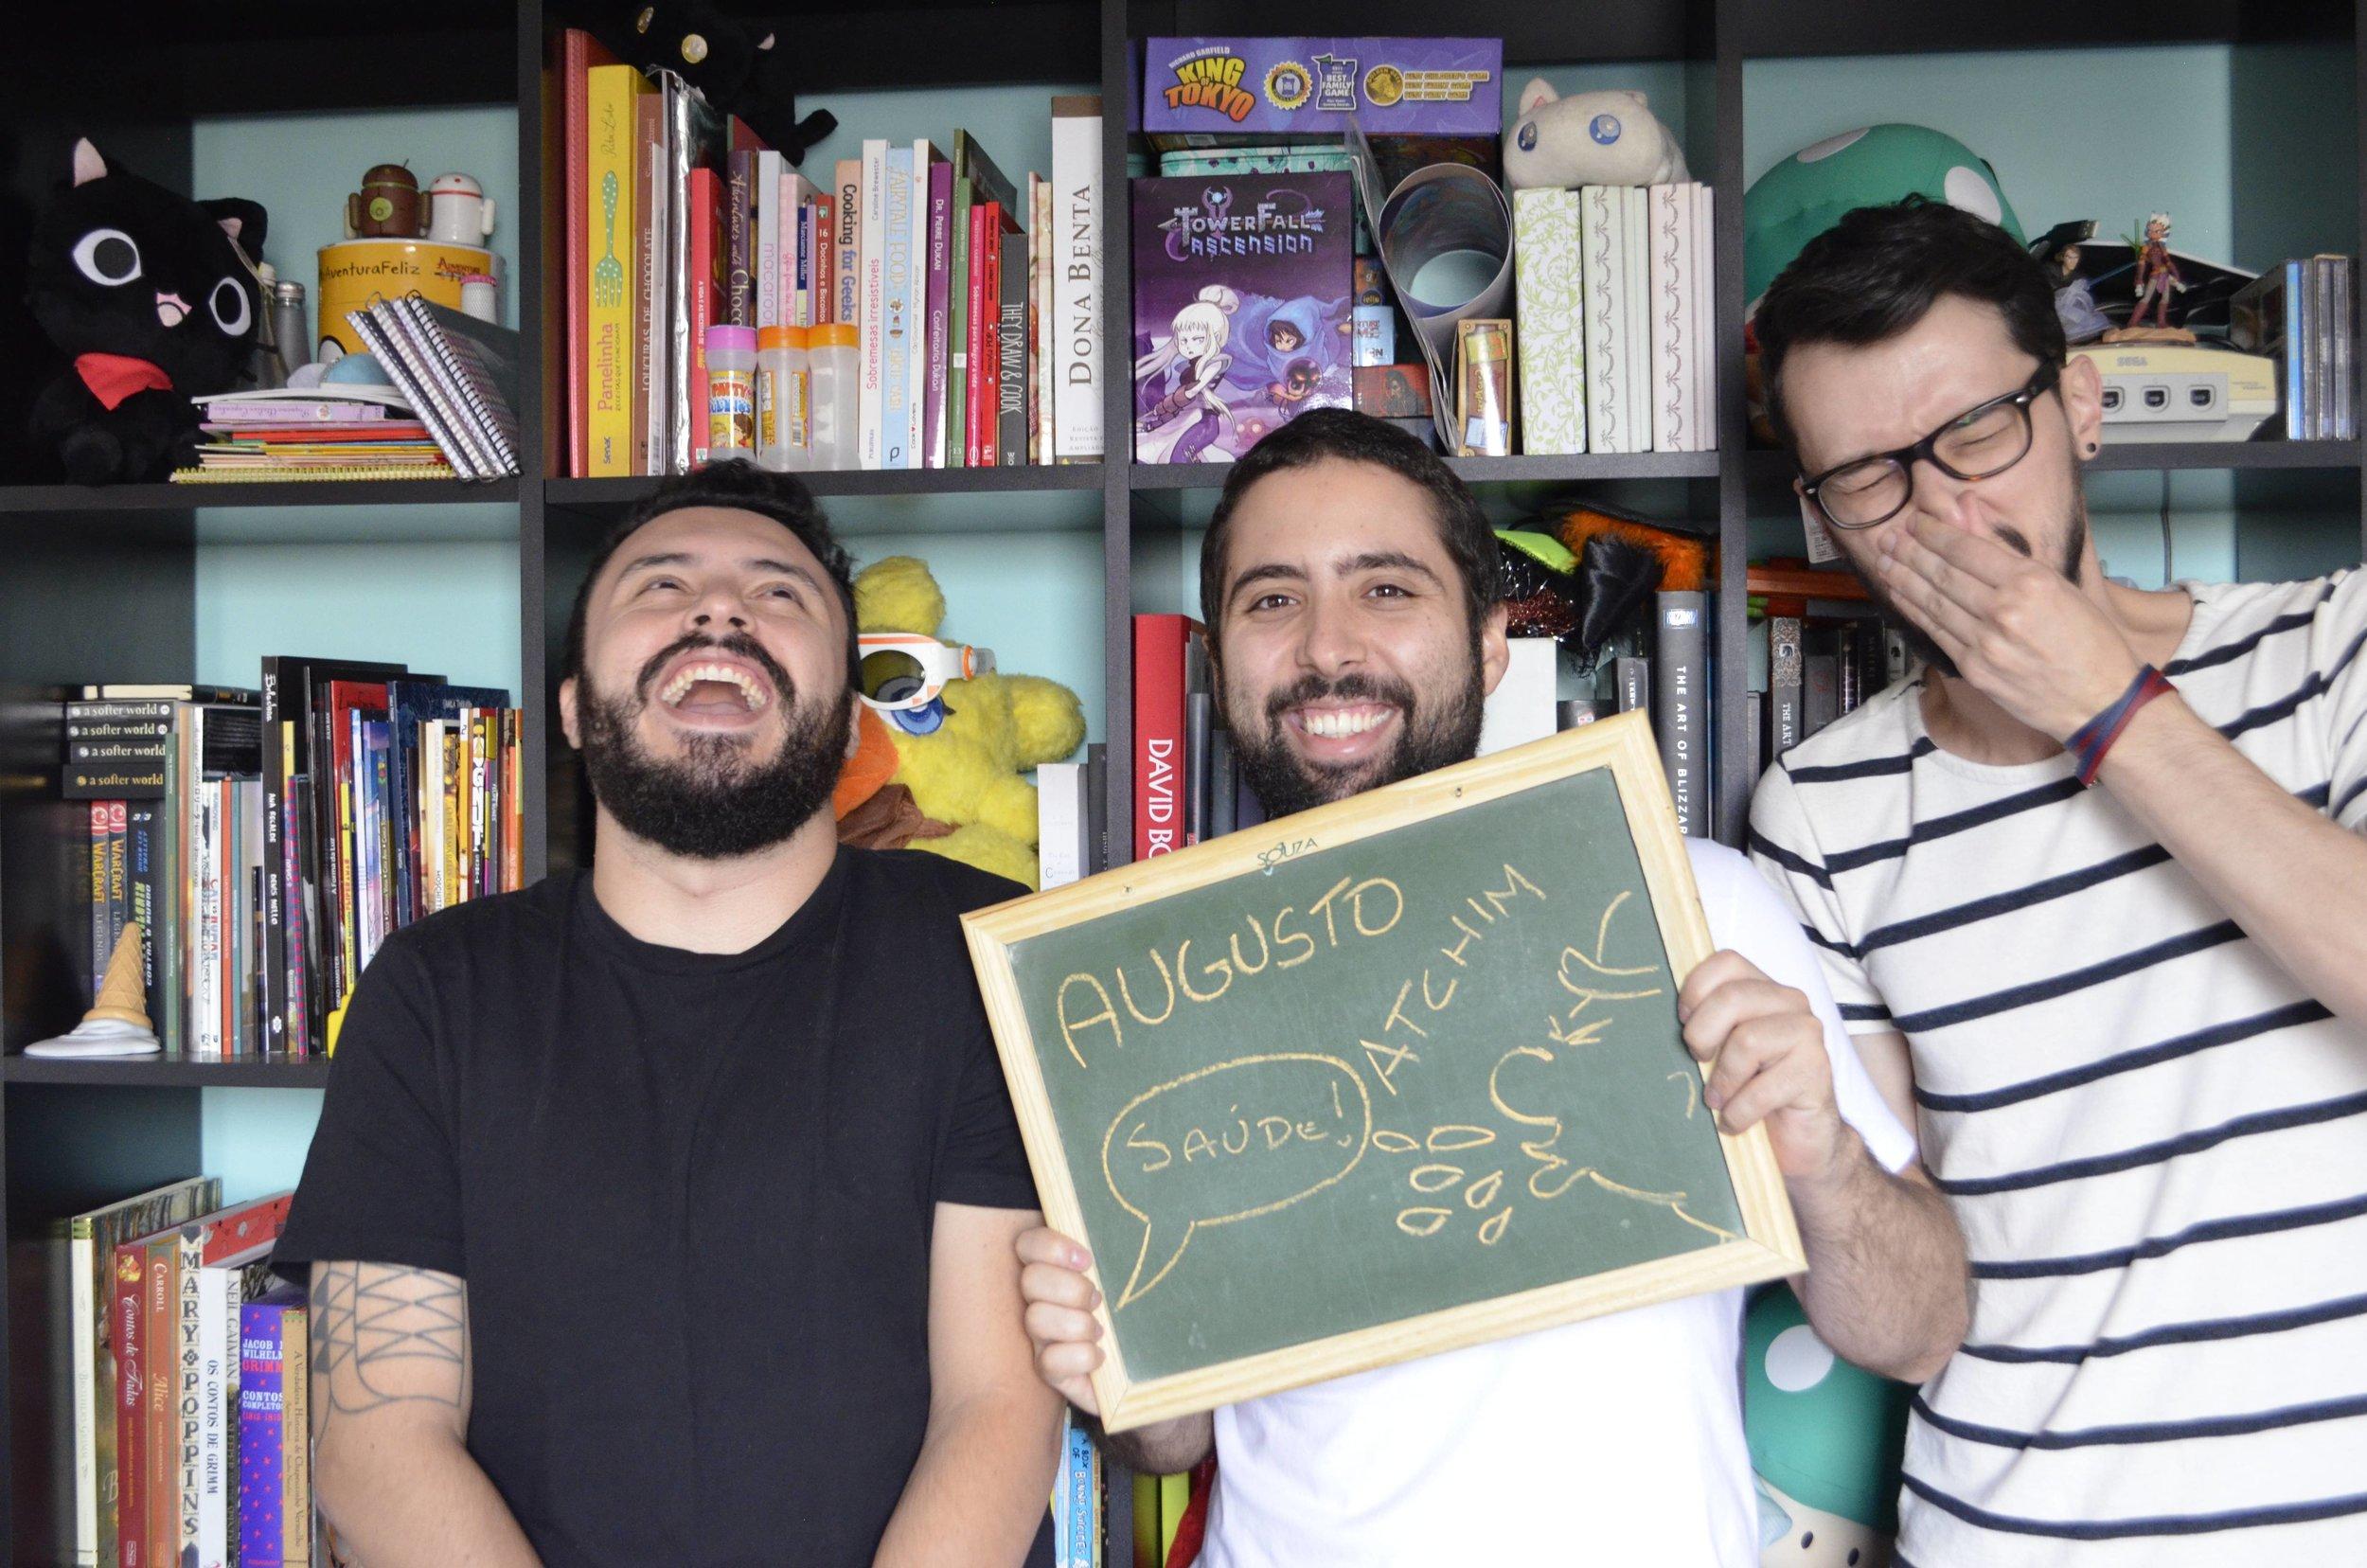 Augusto-Saúde.jpg